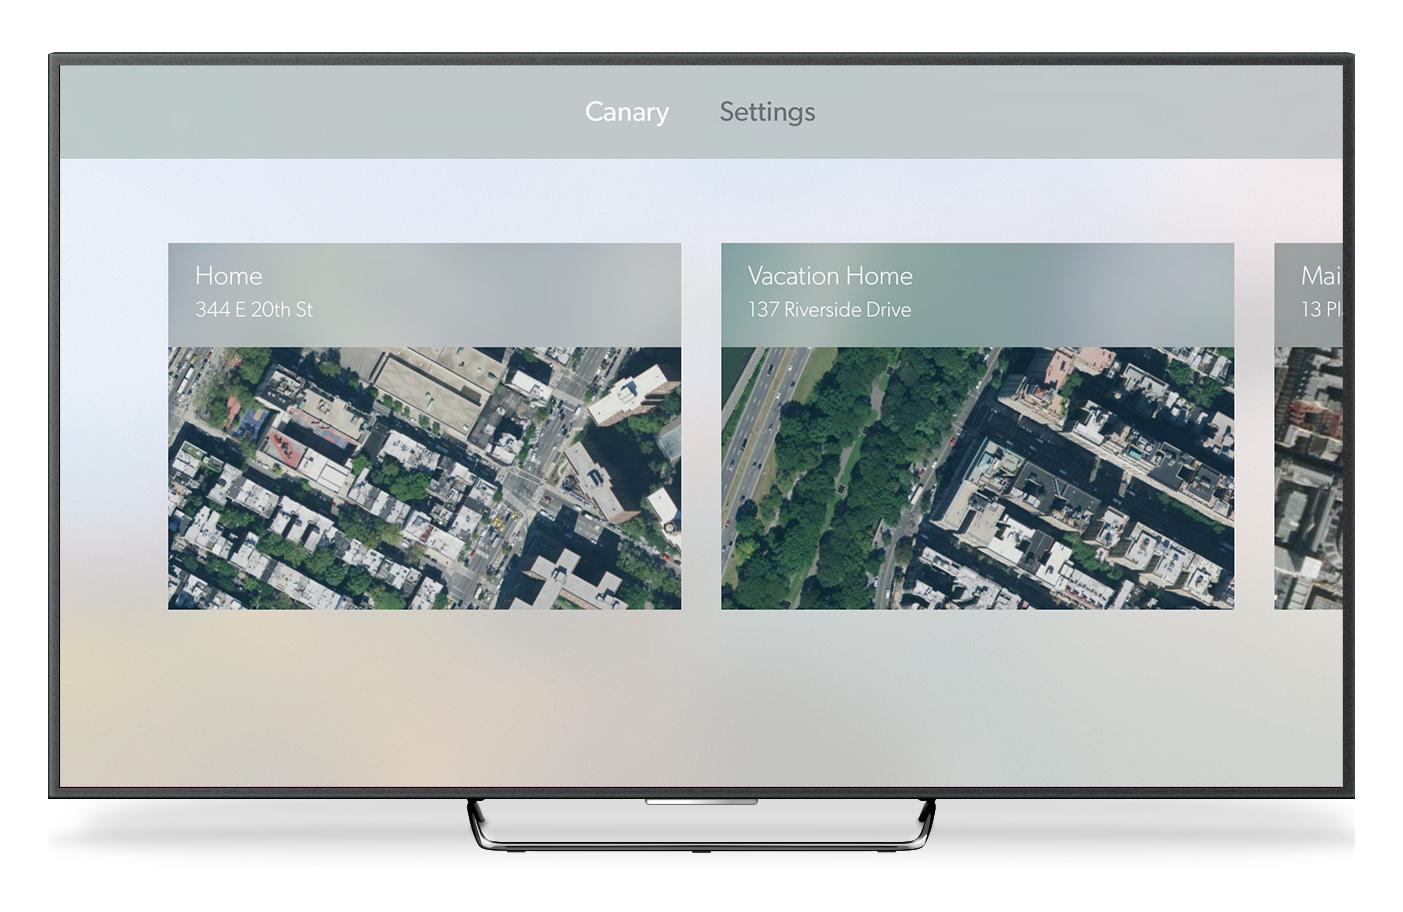 tv-image-1